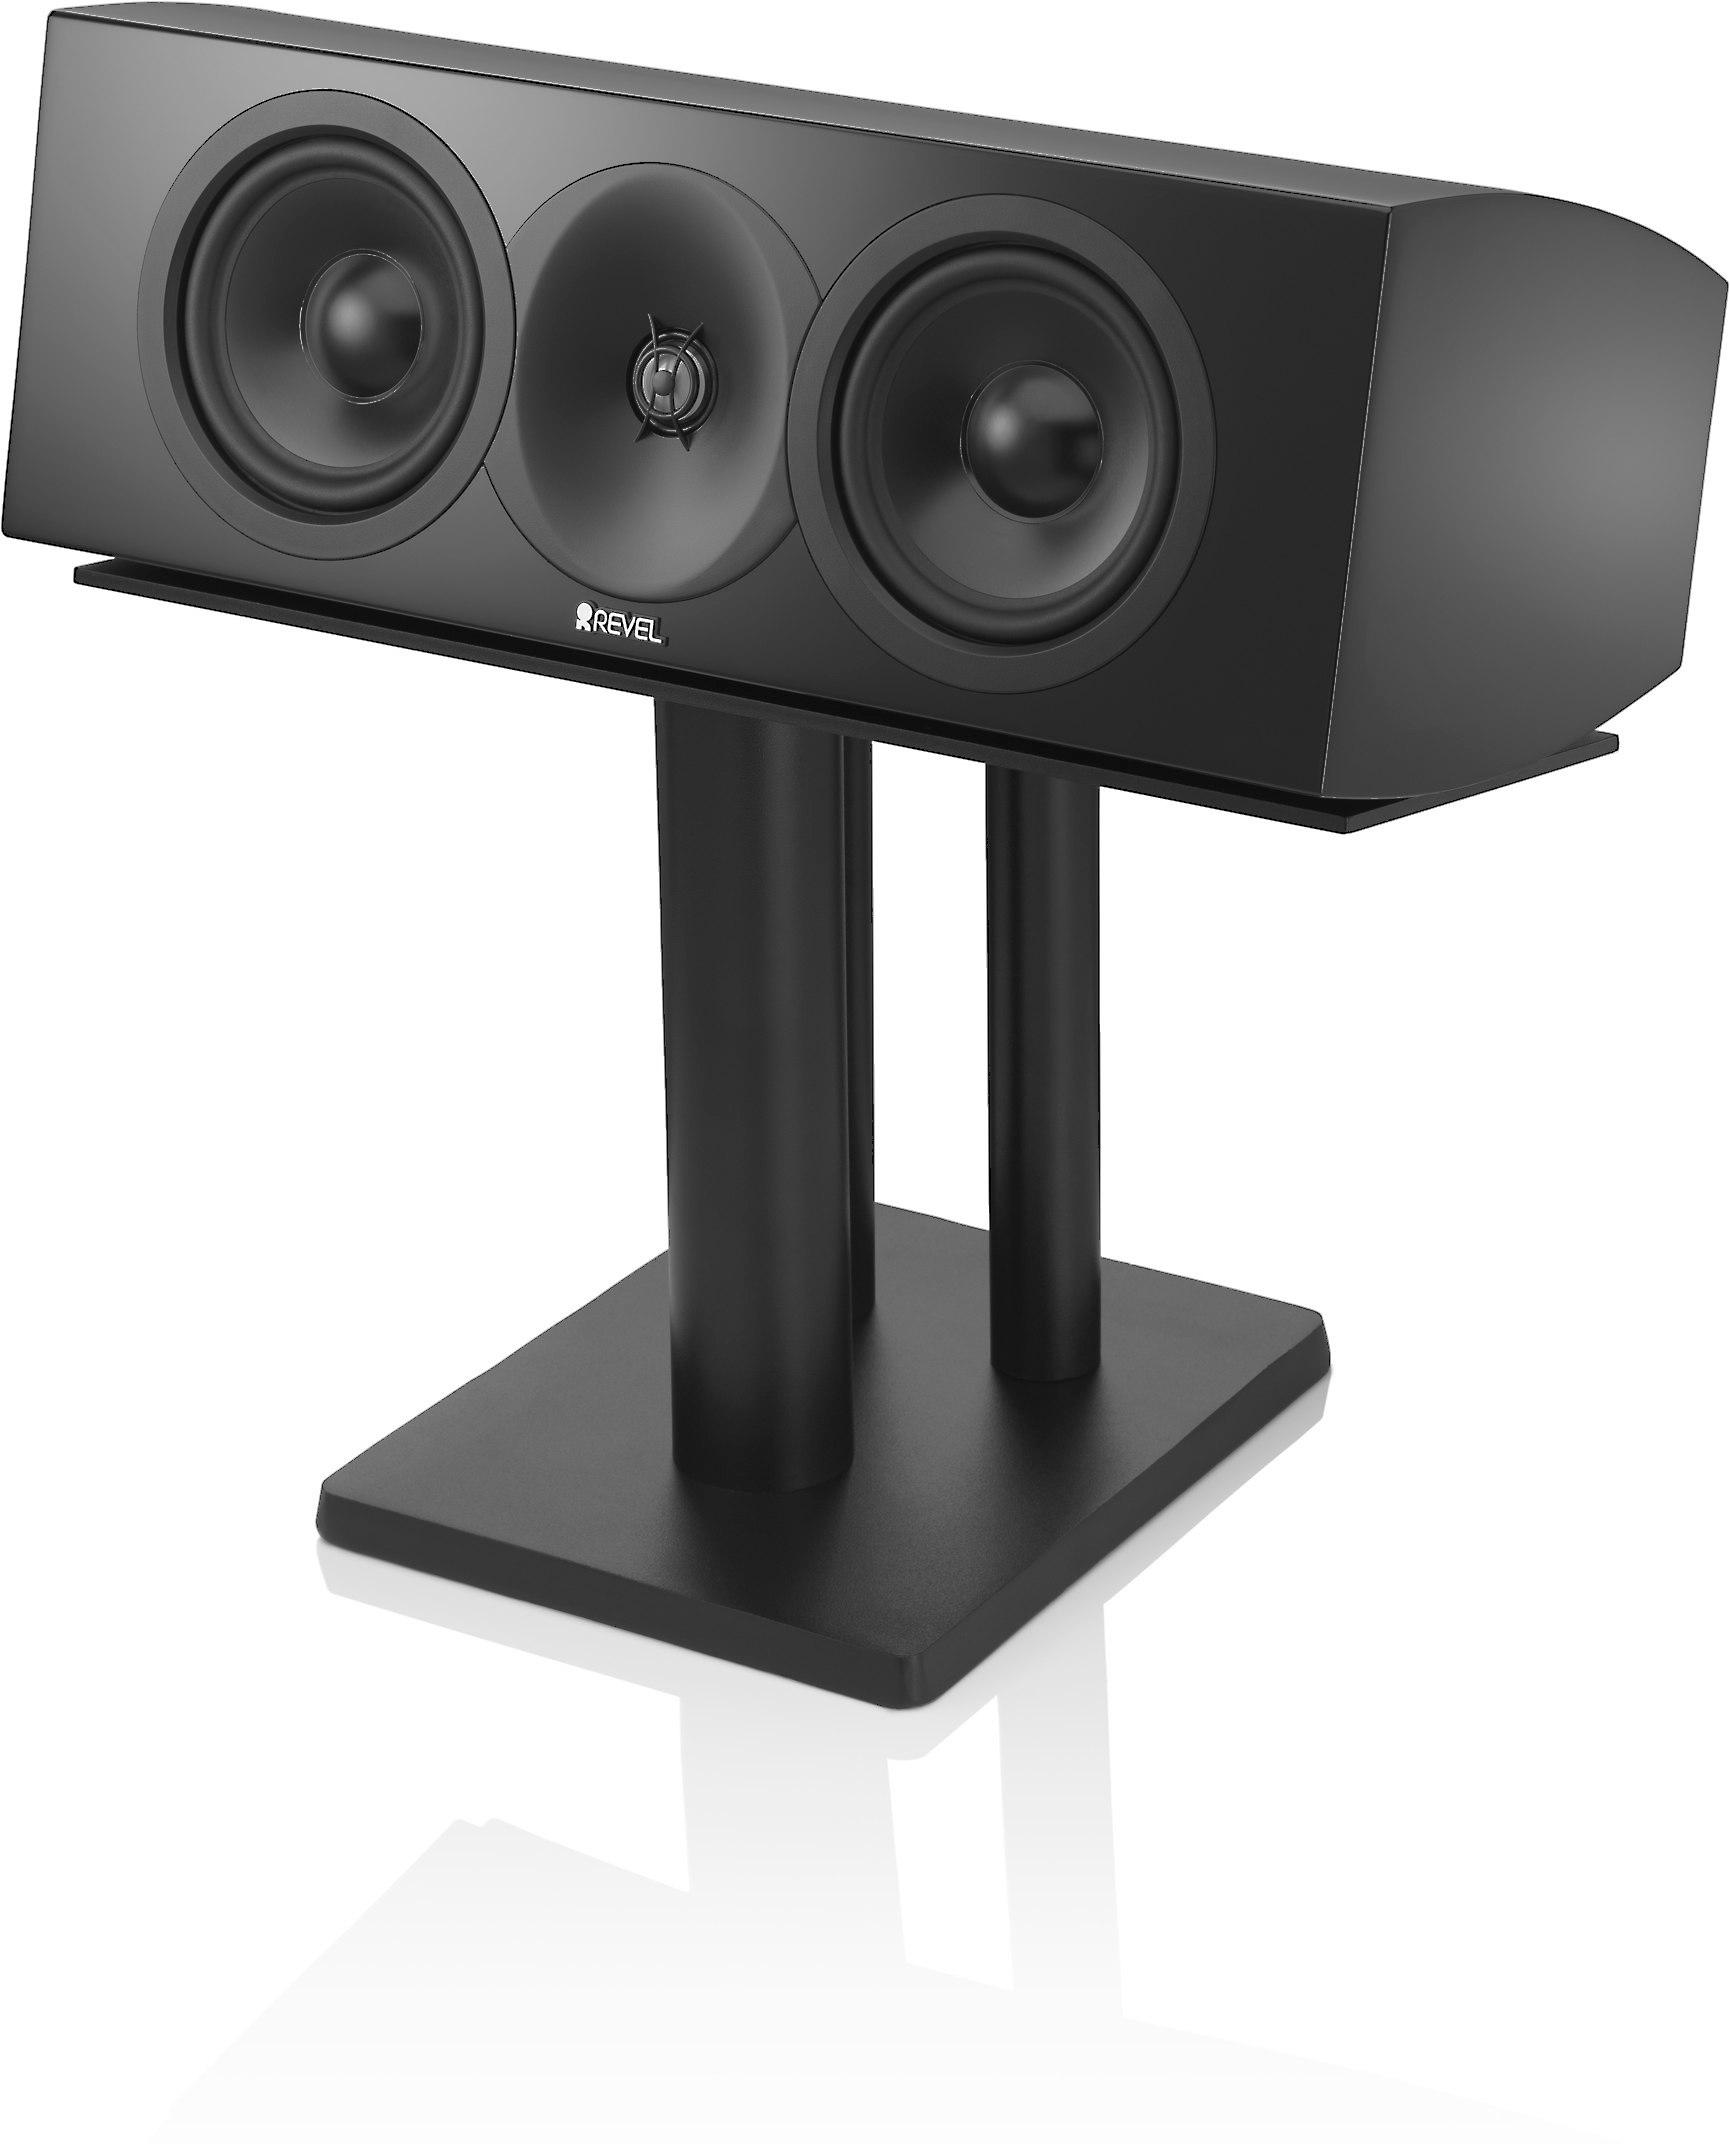 Revel C25 Stand Pedestal Stand For Revel Concerta2 C25